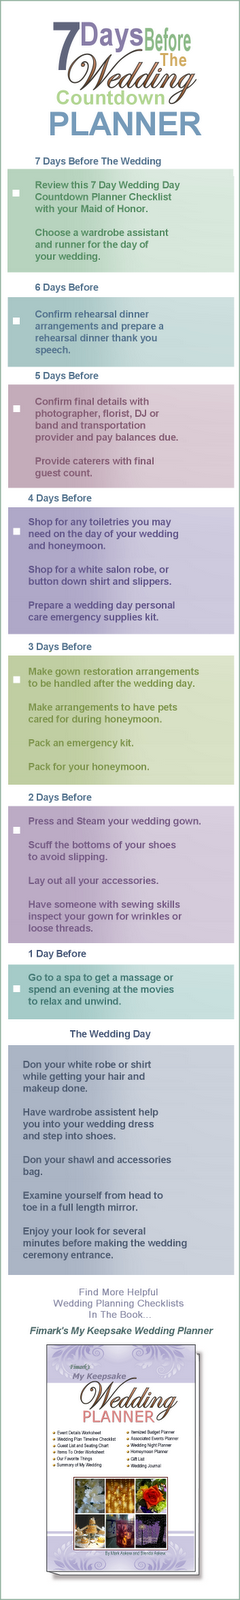 Wedding Blog: 7 Day Wedding Countdown Checklist Bookmark